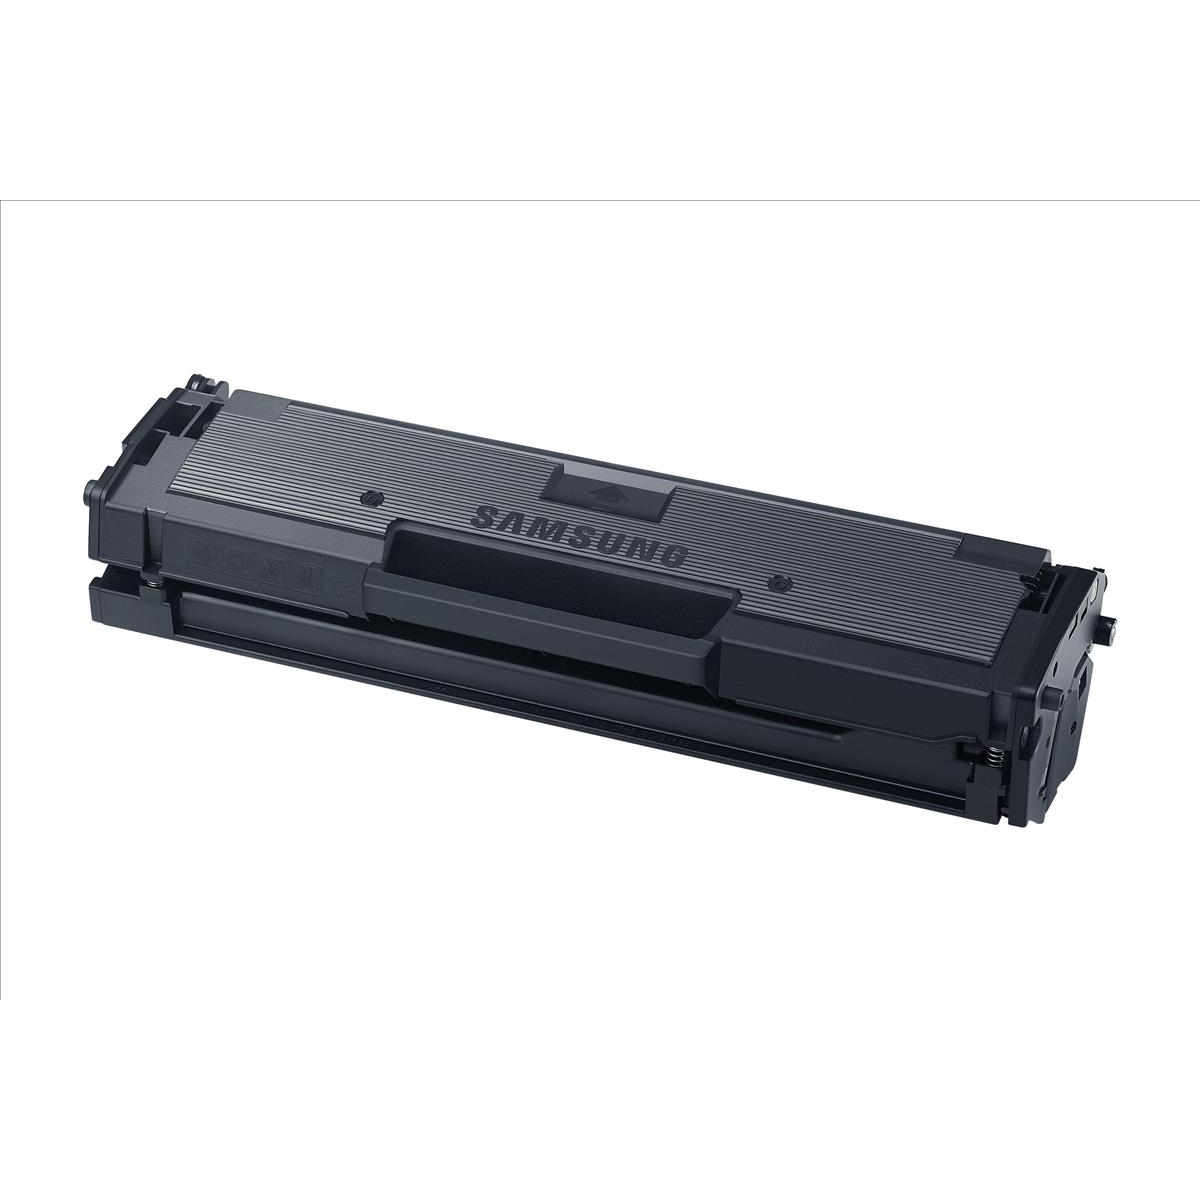 Samsung MLT-D111S Laser Toner Cartridge Page Life 1000pp Black Ref SU810A